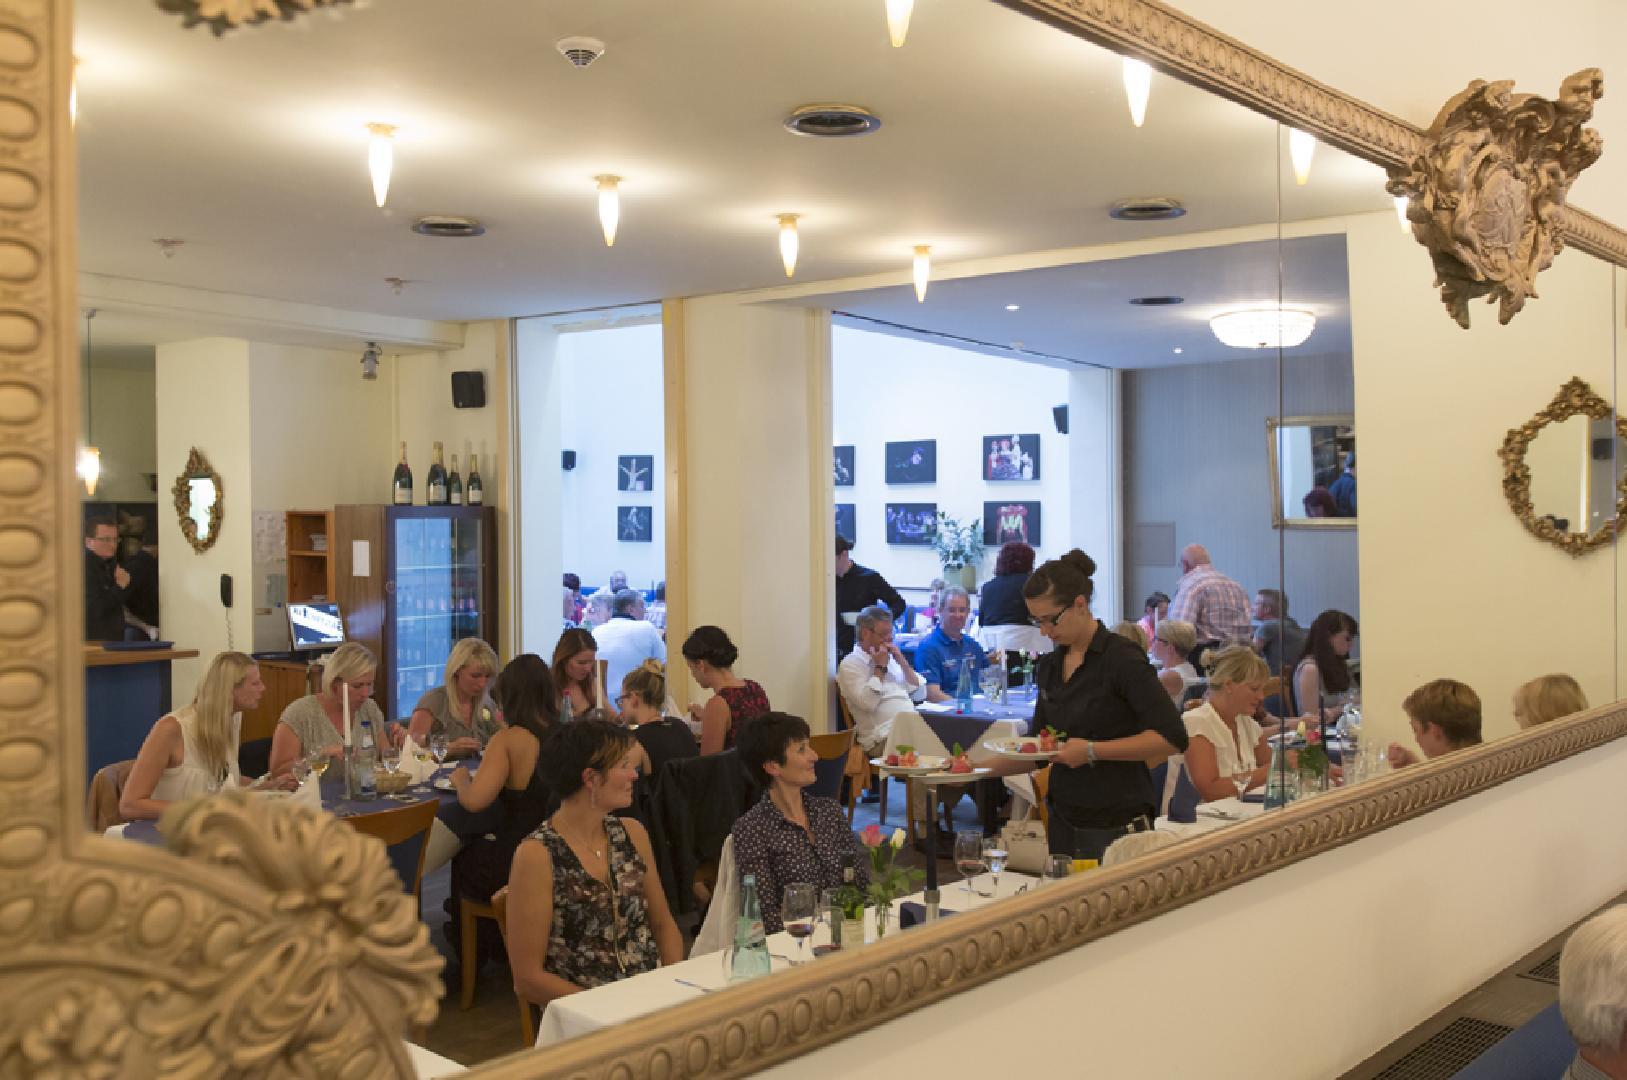 Restaurant (Foto: Tom Schulze)